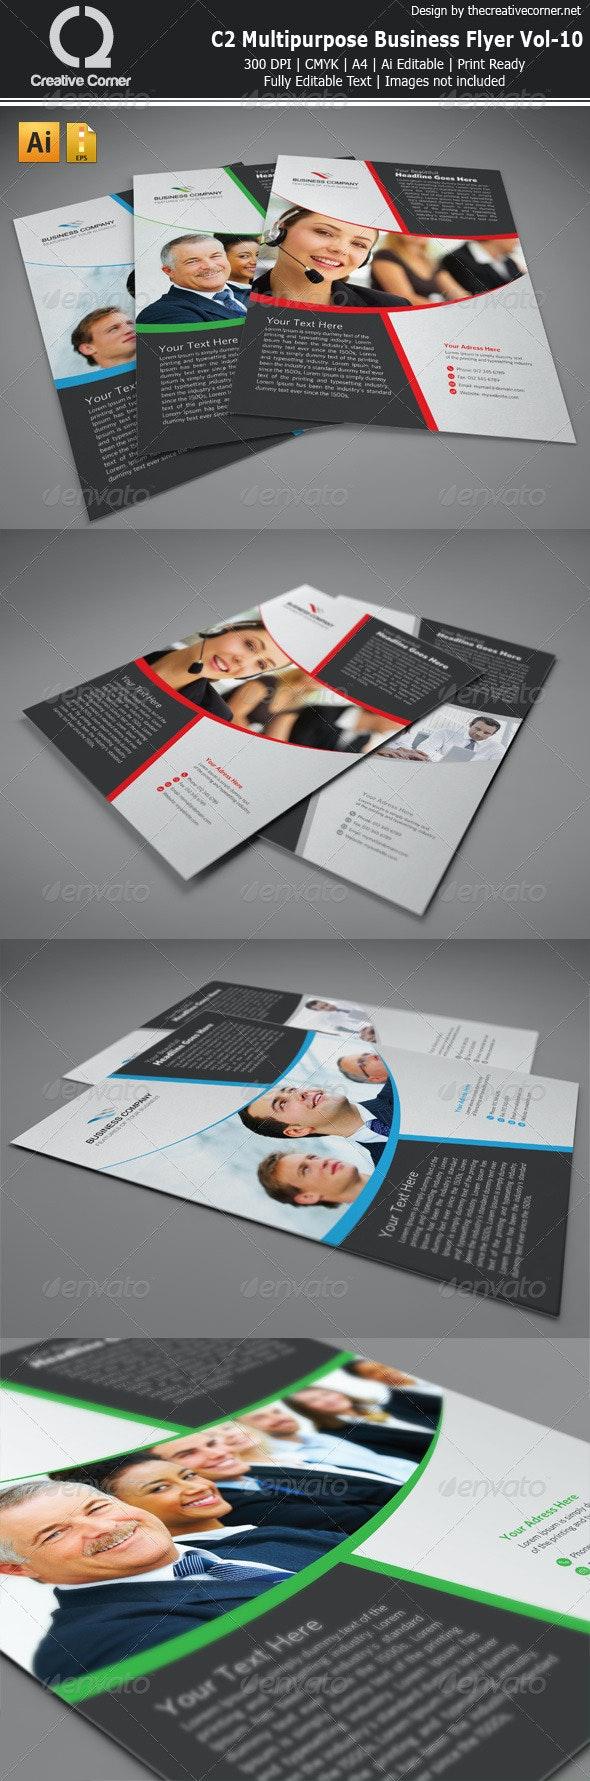 C2 Multipurpose Business Flyer Vol-10 - Corporate Flyers